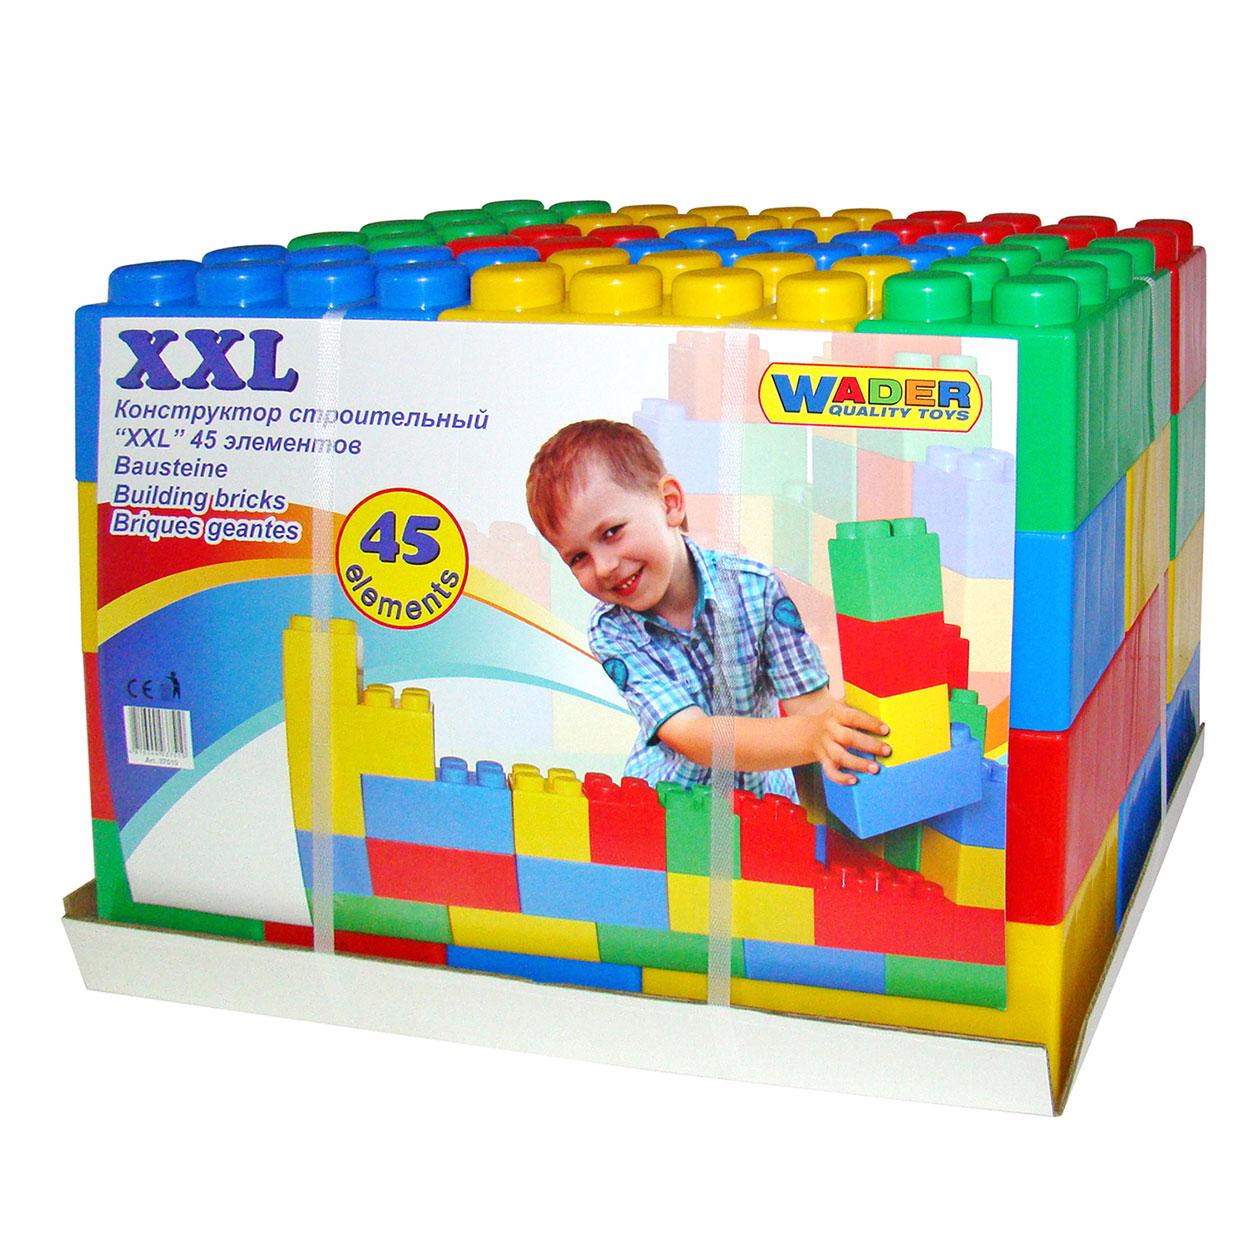 Polesie Bouwblokken XXL, 45dlg. online kopen | Lobbes Speelgoed